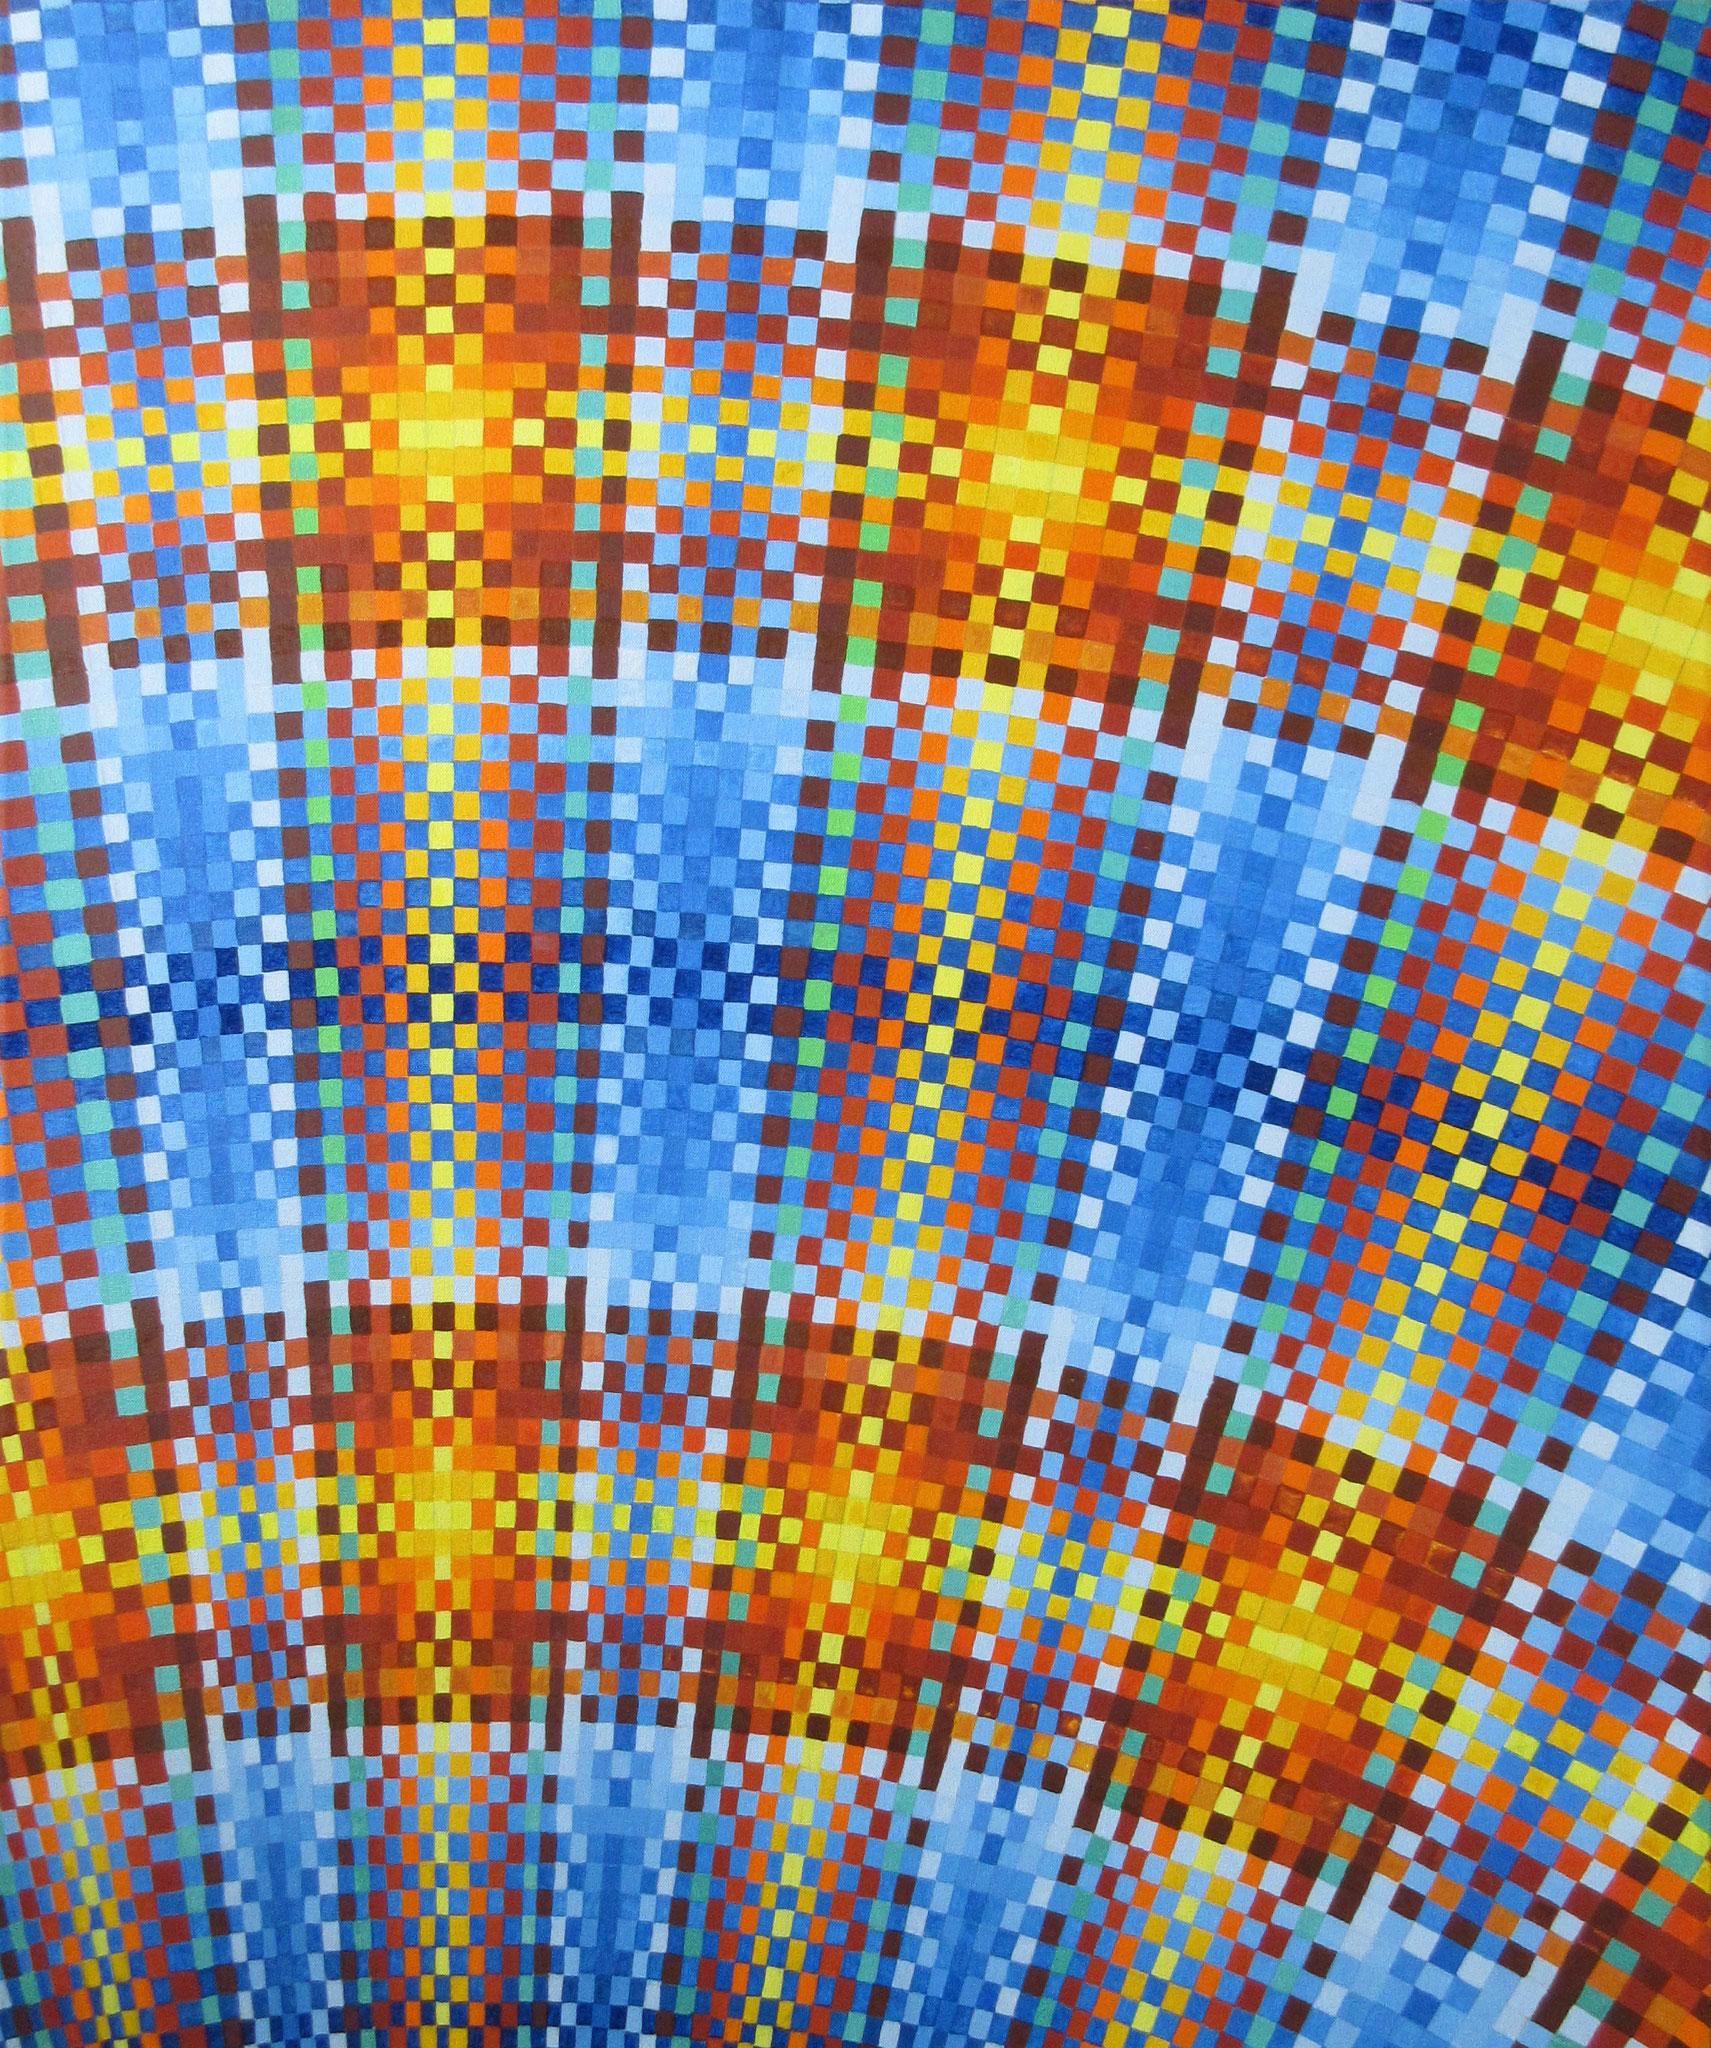 "#451 - ""Fabric of Life III"", oil on canvas 30x36, Feb.2018"